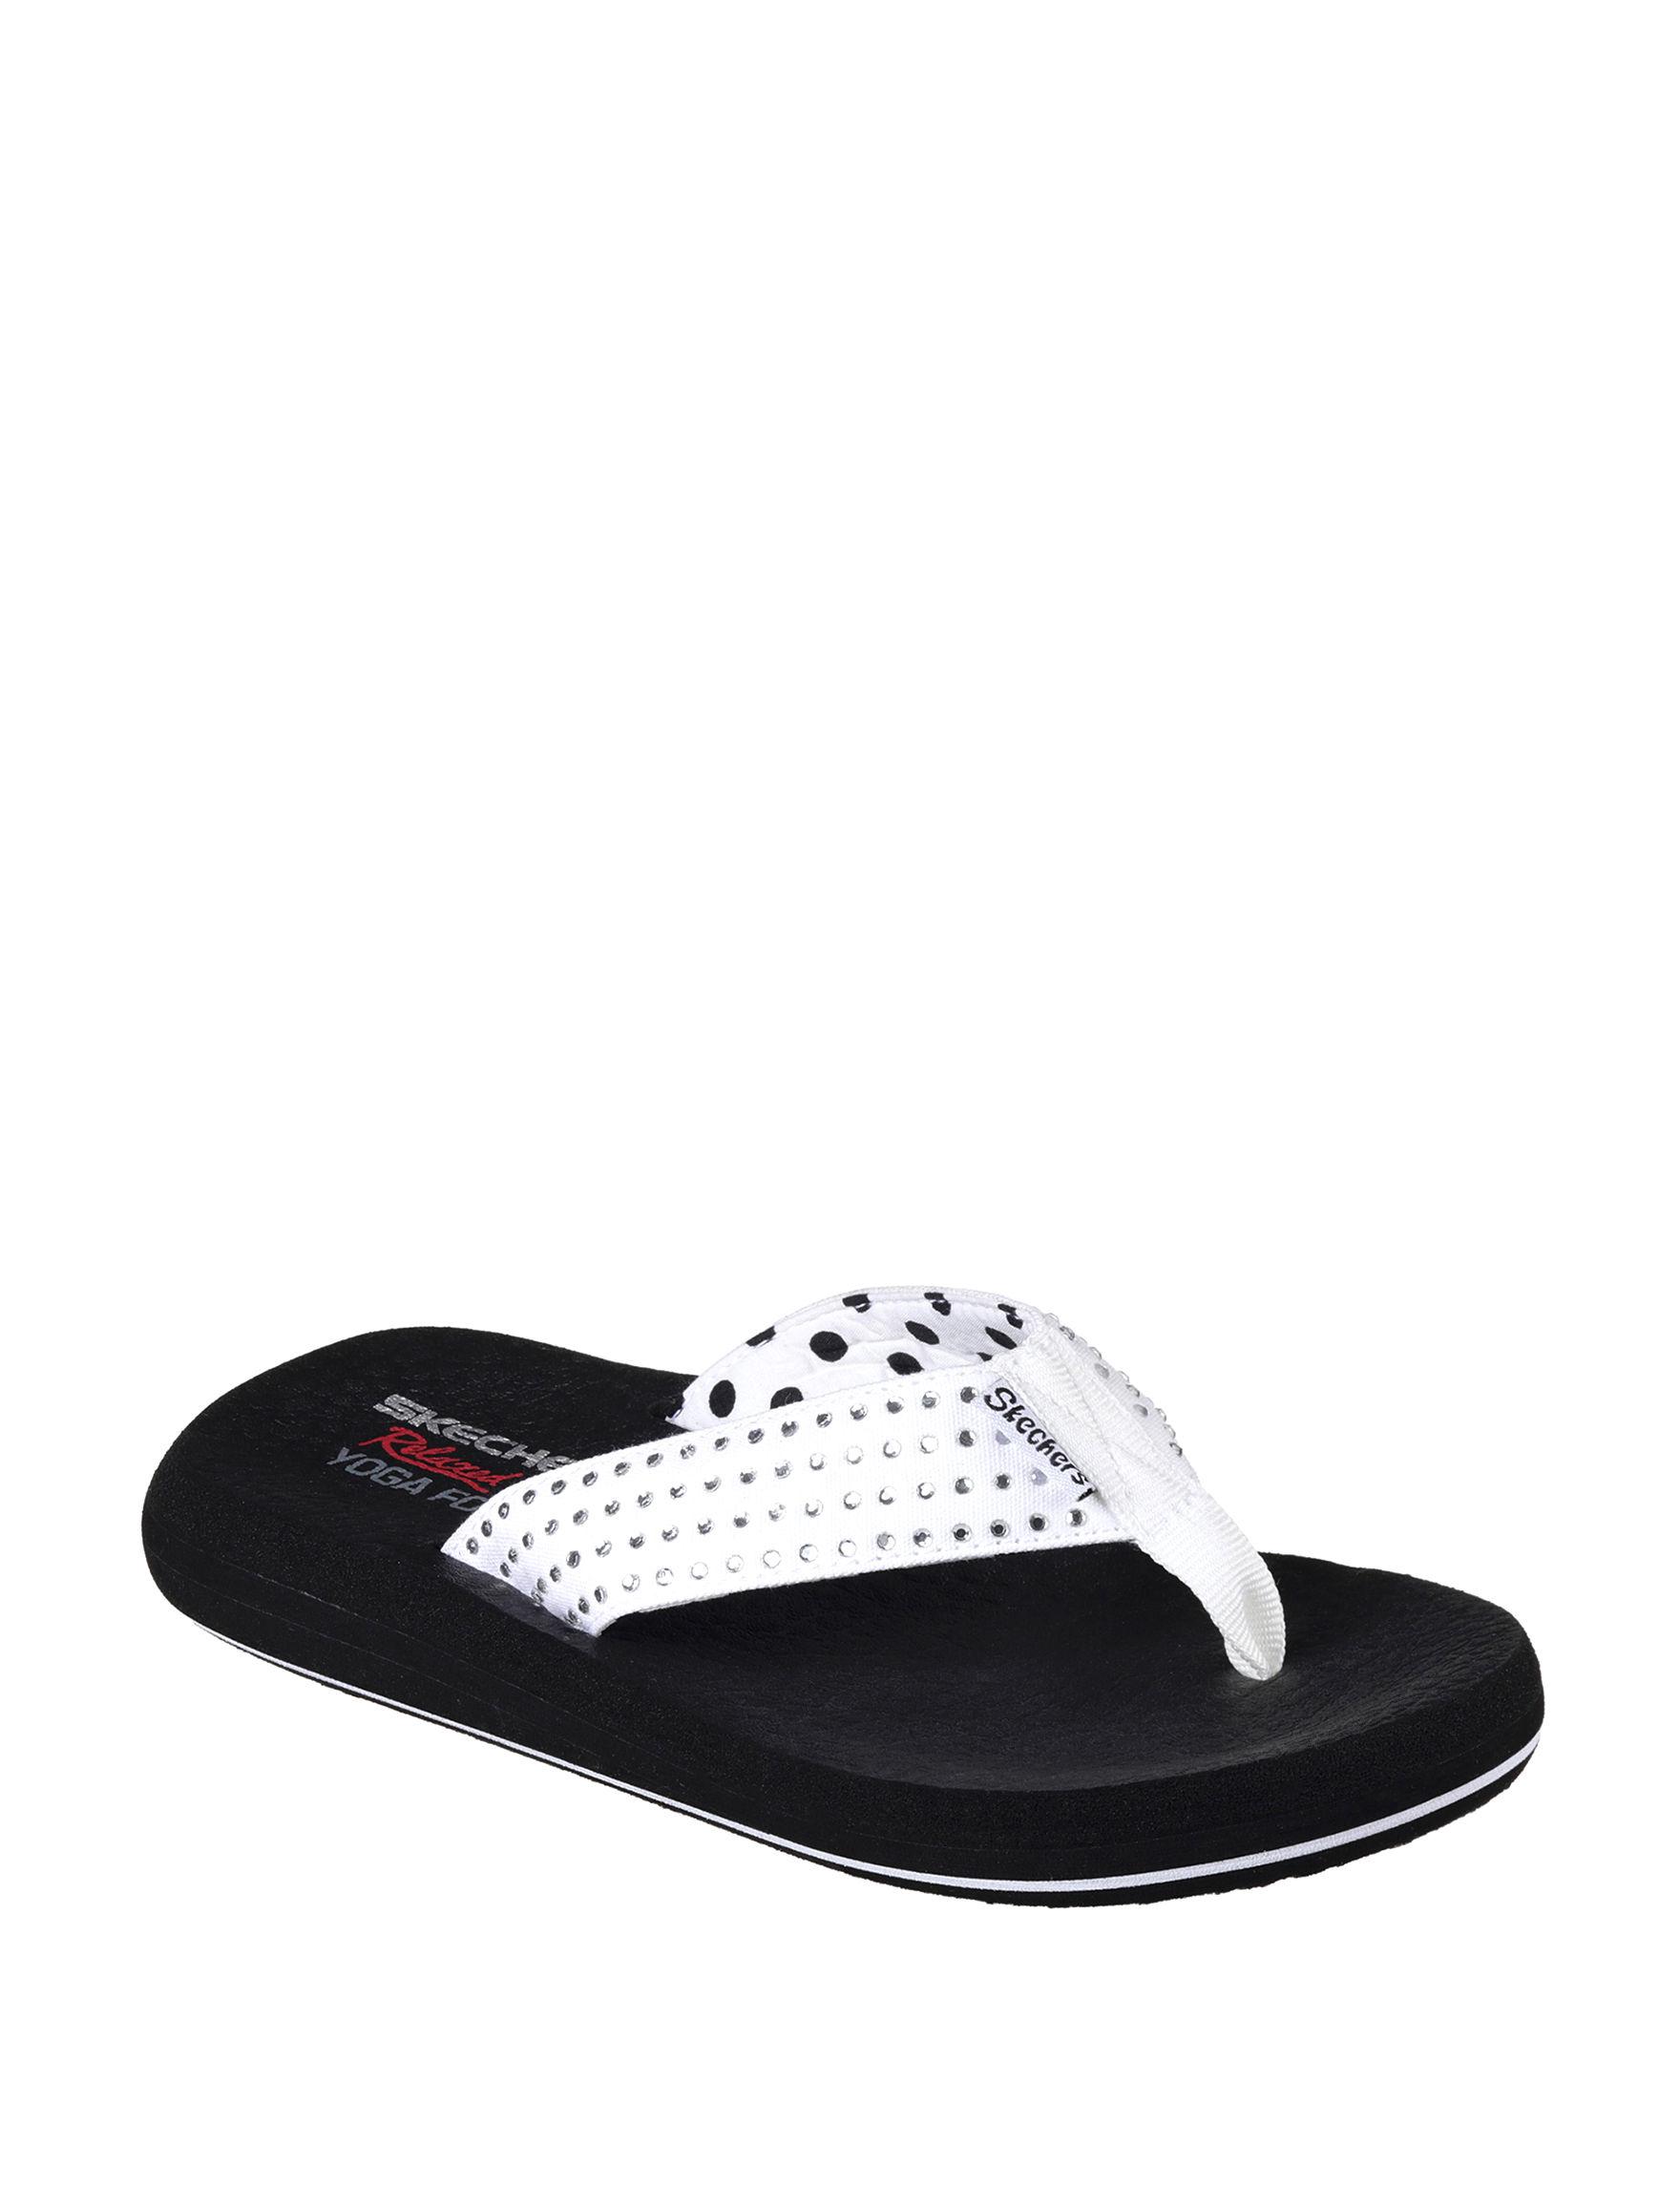 d87437713158 Skechers Asana New Age Flip Flops